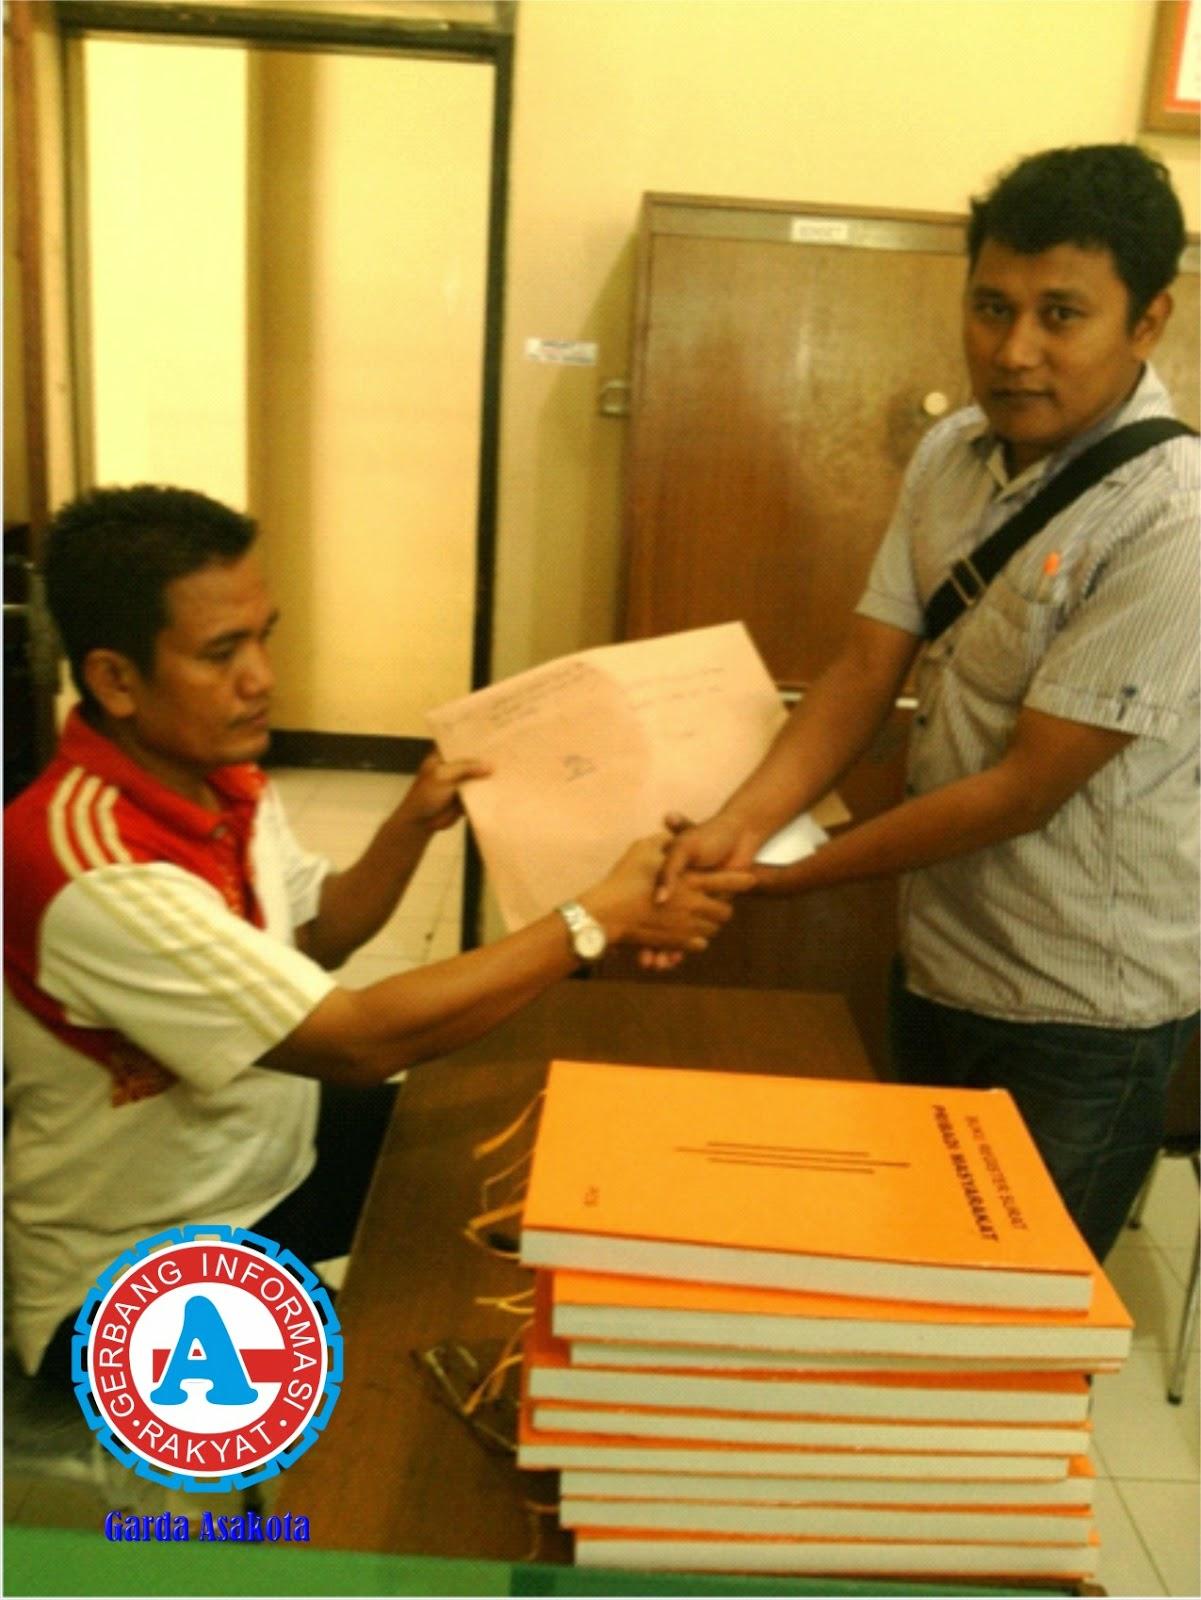 Gerak NTB Serahkan Dokumen Laporan  Dugaan Korupsi APBD Dompu ke Polda NTB